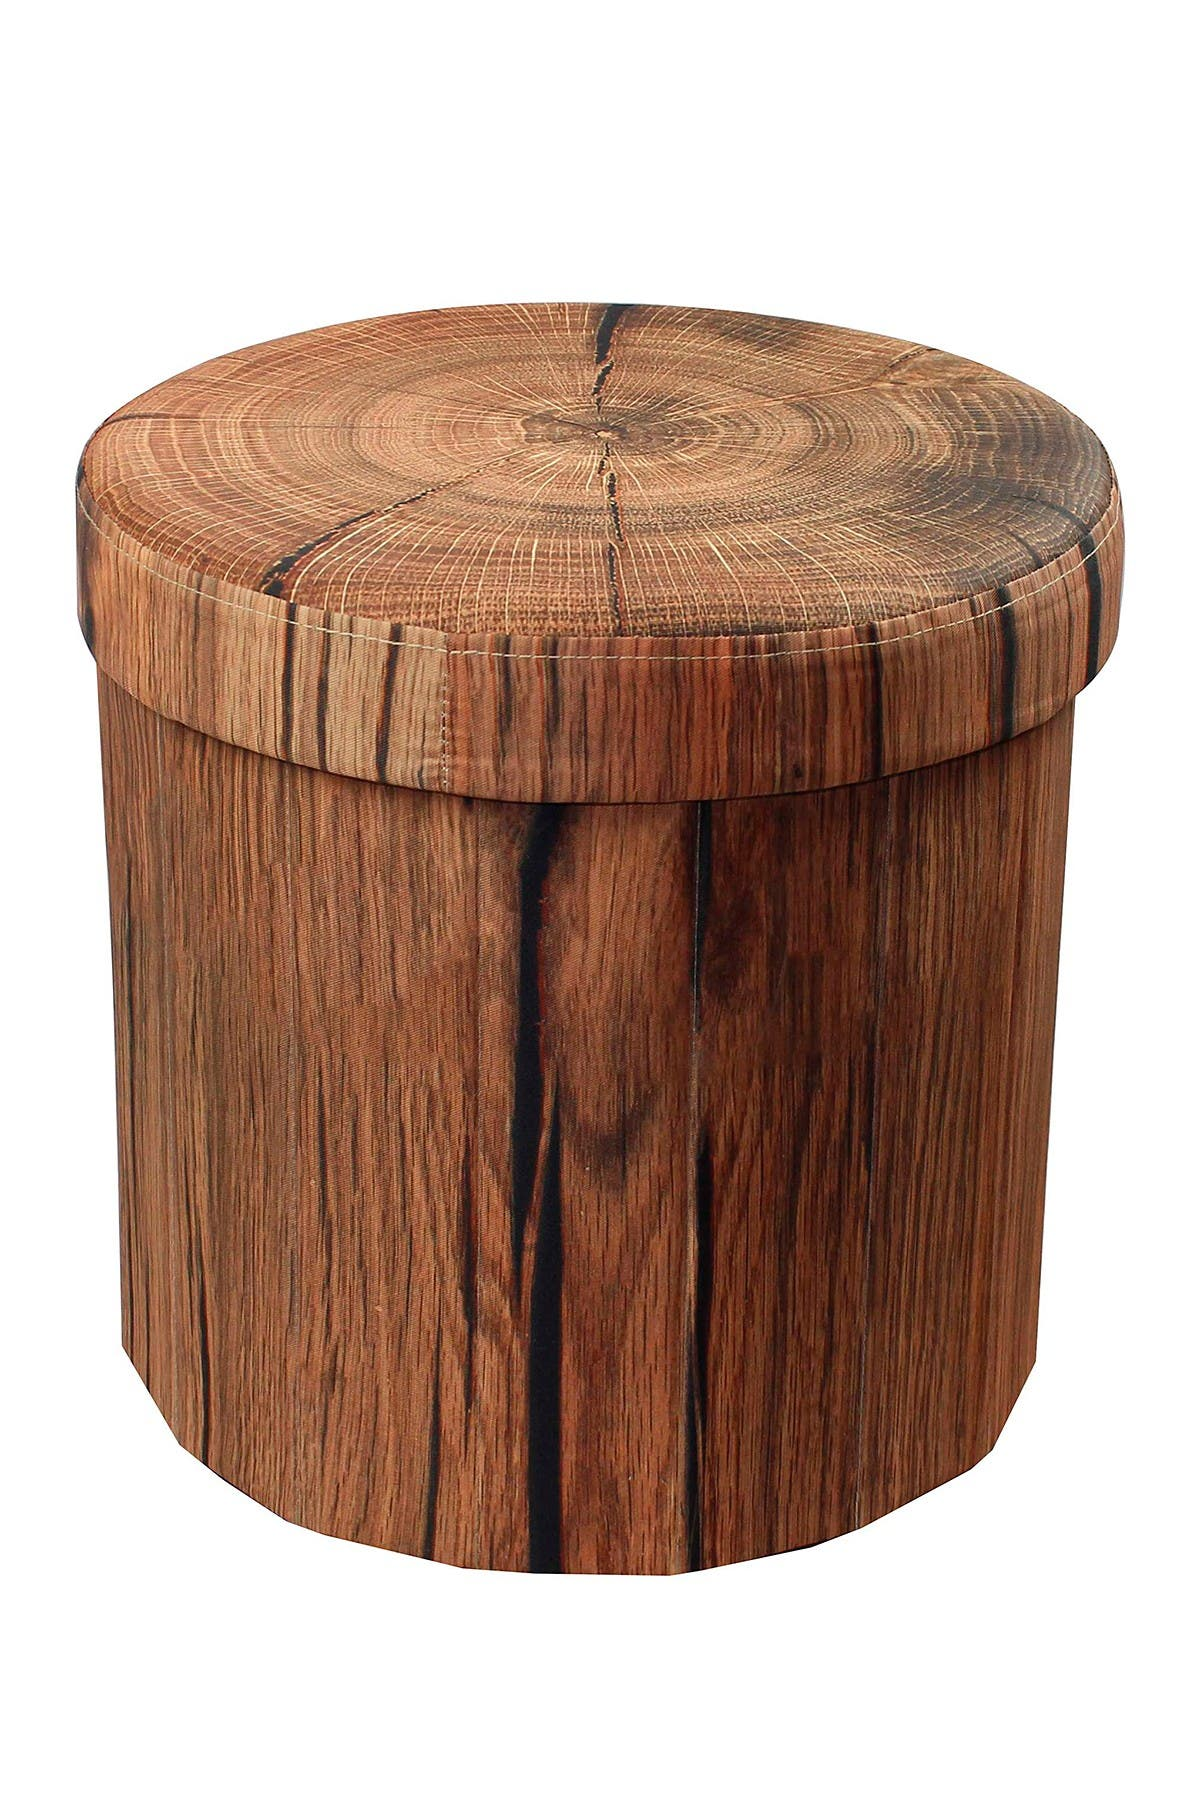 Image of Sorbus Foldable Printed Round Storage Ottoman - Tree Stump